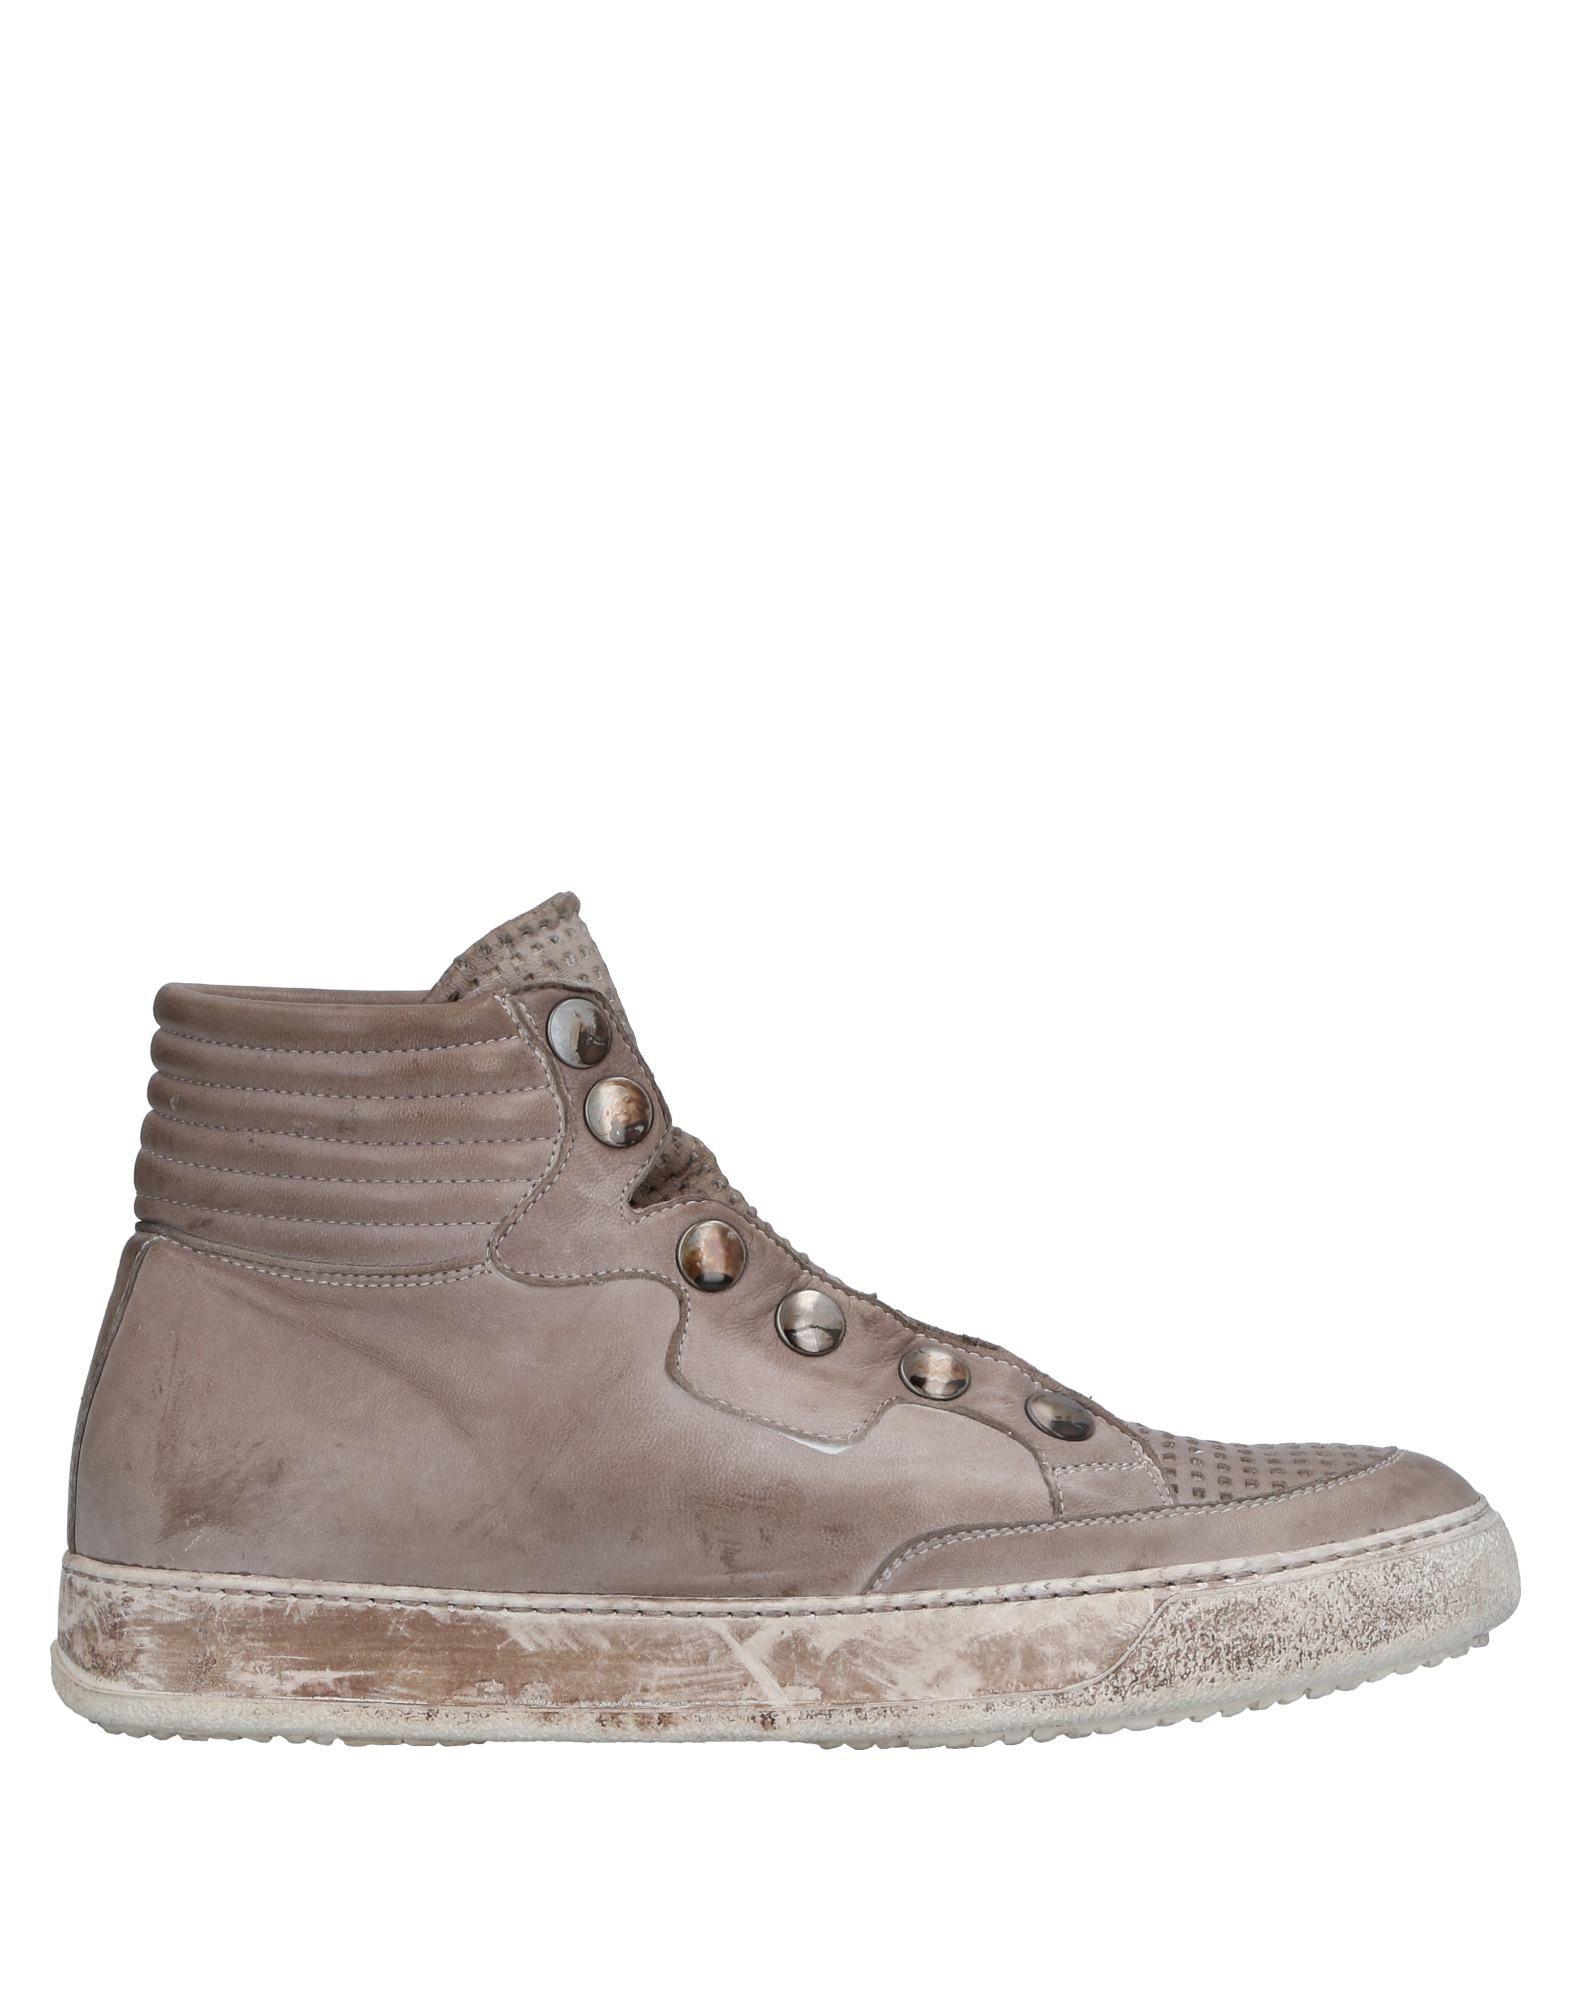 Bruno Bordese Sneakers Herren  11533170GJ Gute Qualität beliebte Schuhe